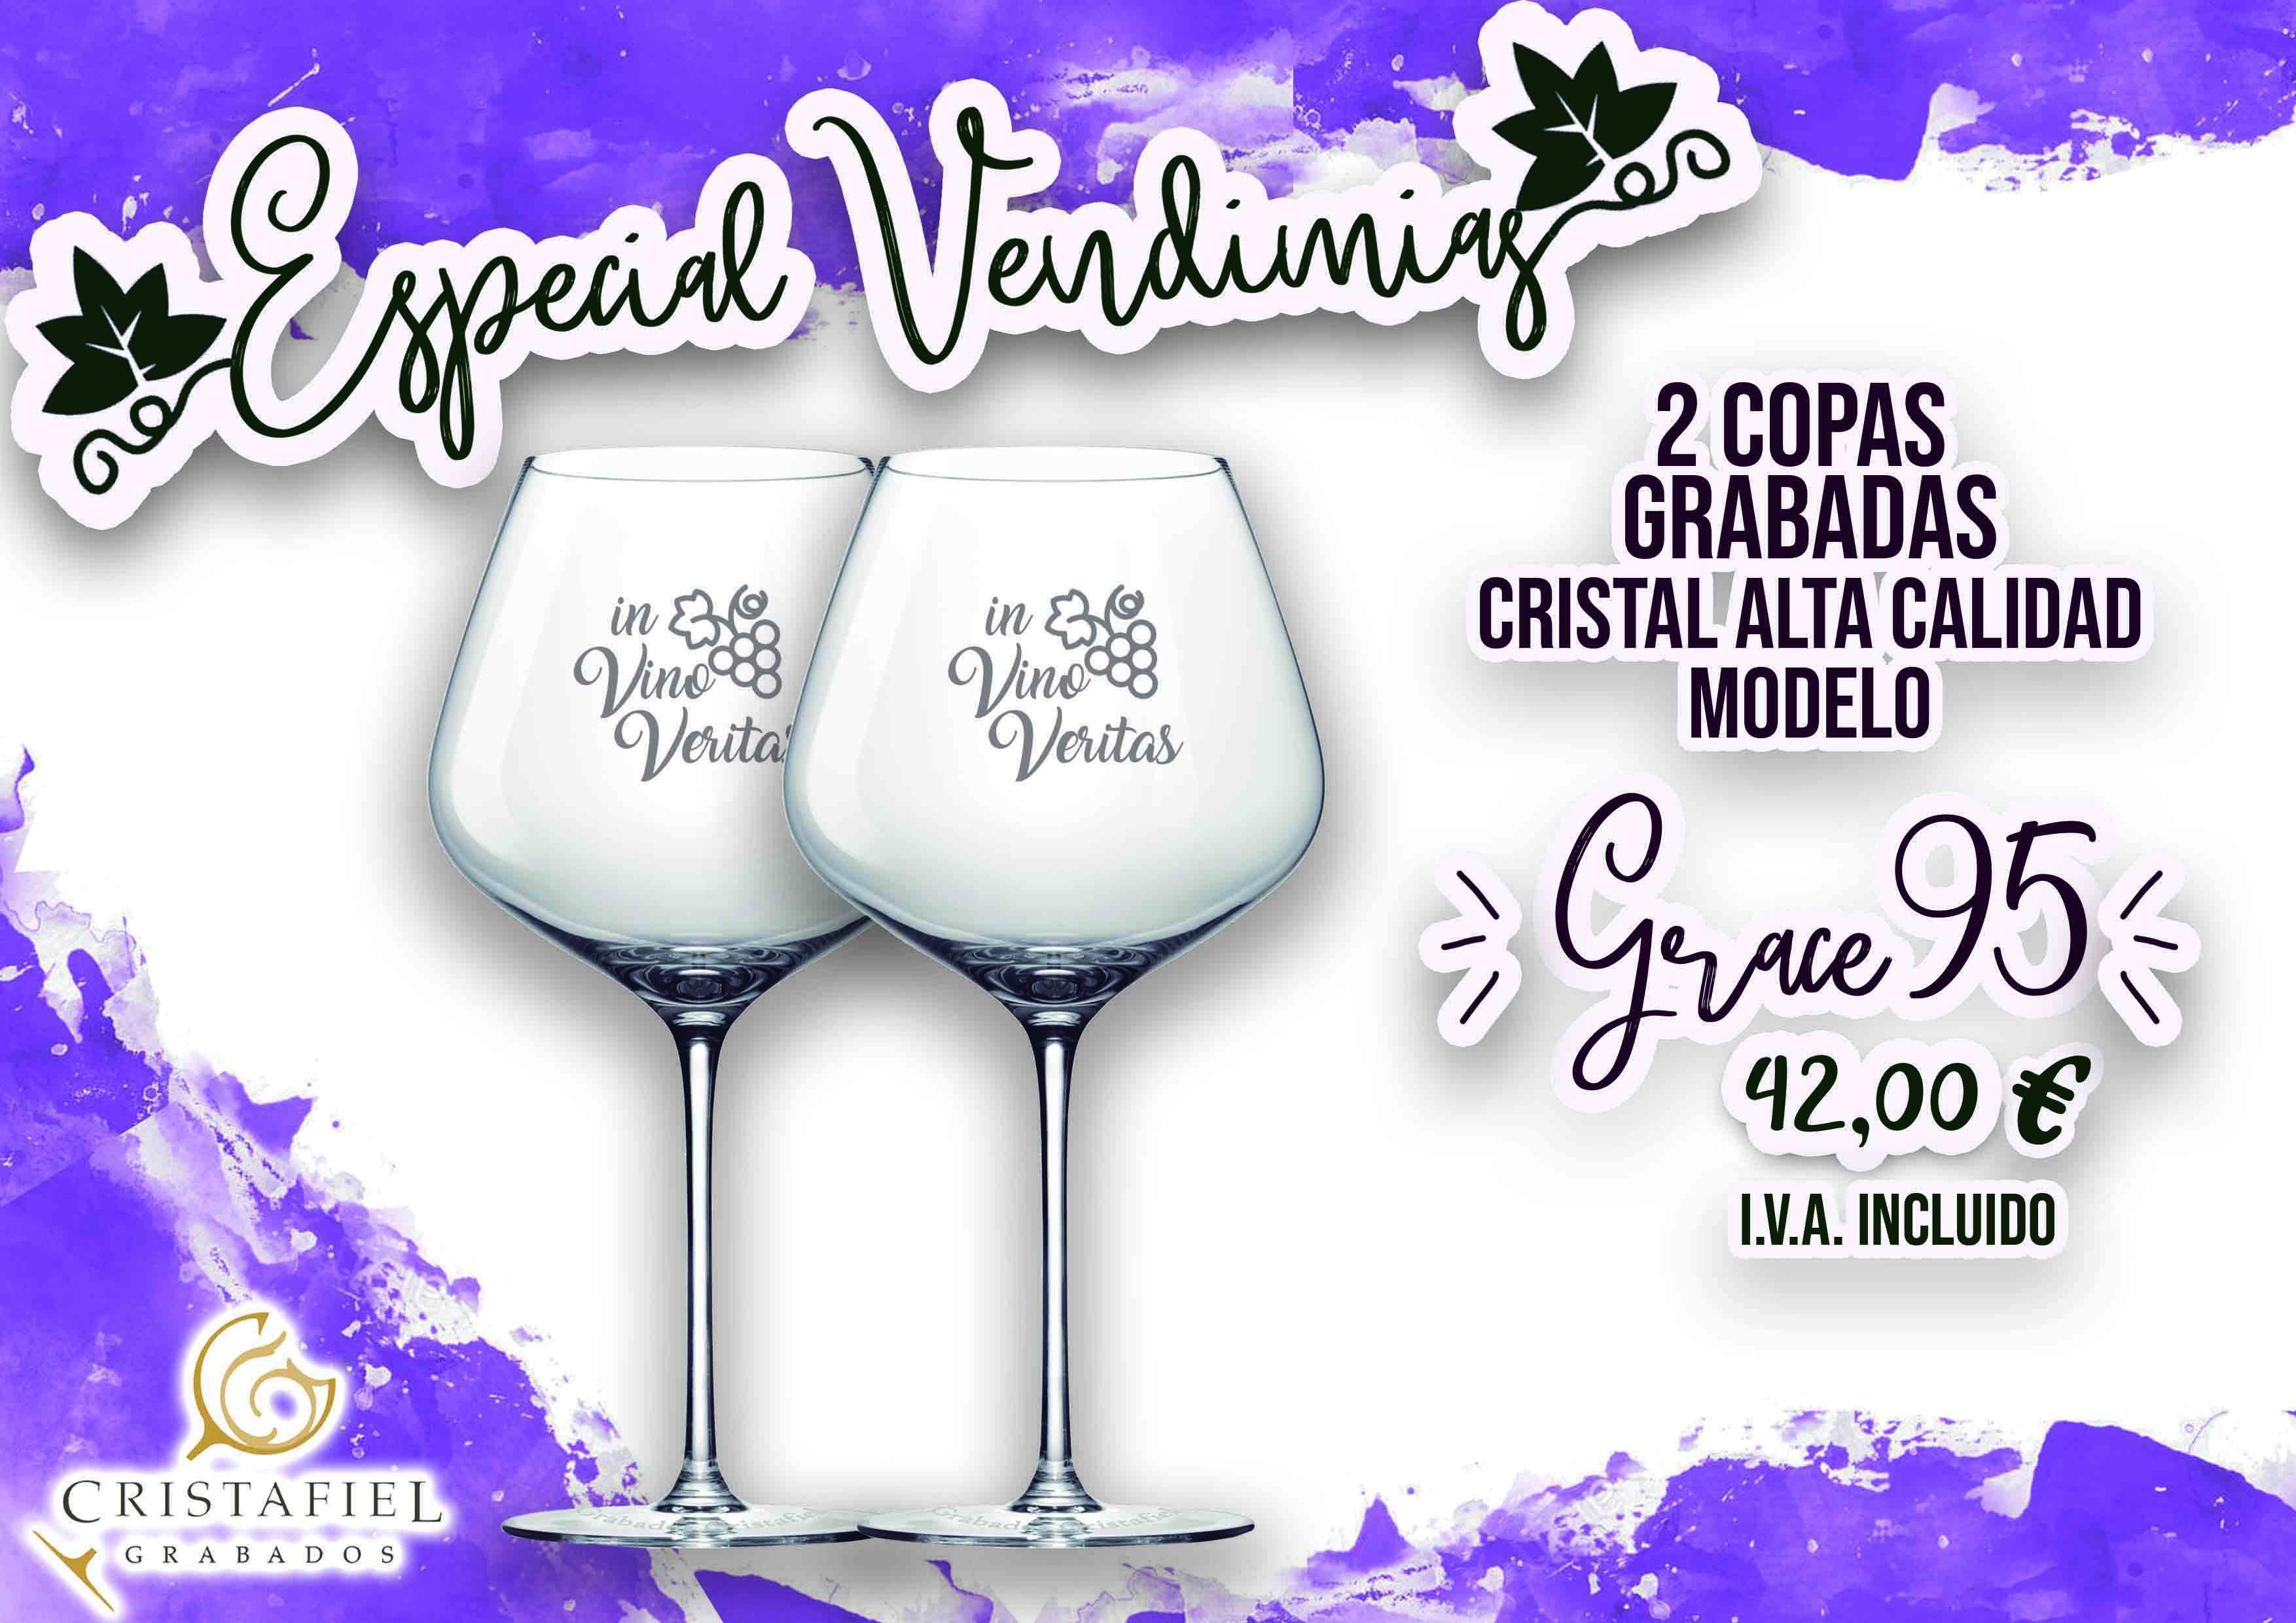 especial_vendimias_copas_grace95_promocion